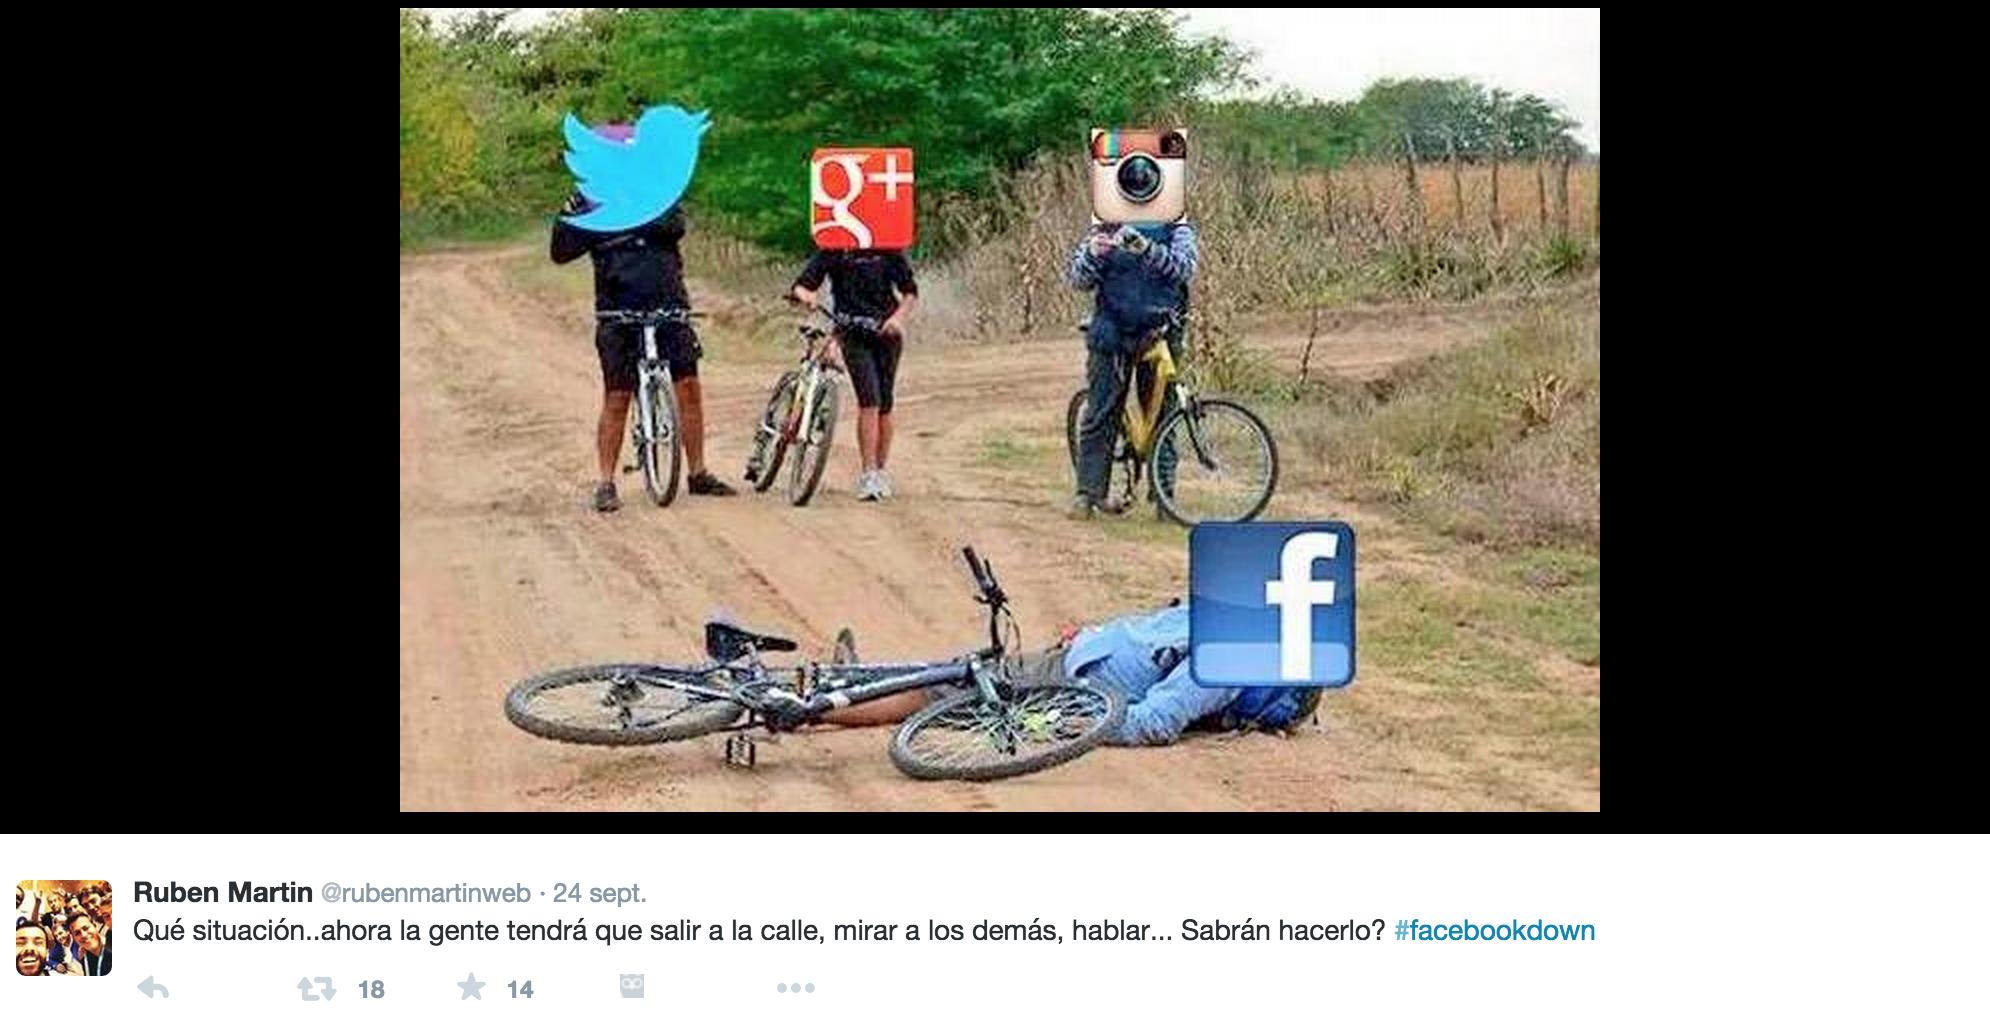 meme #facebookdown